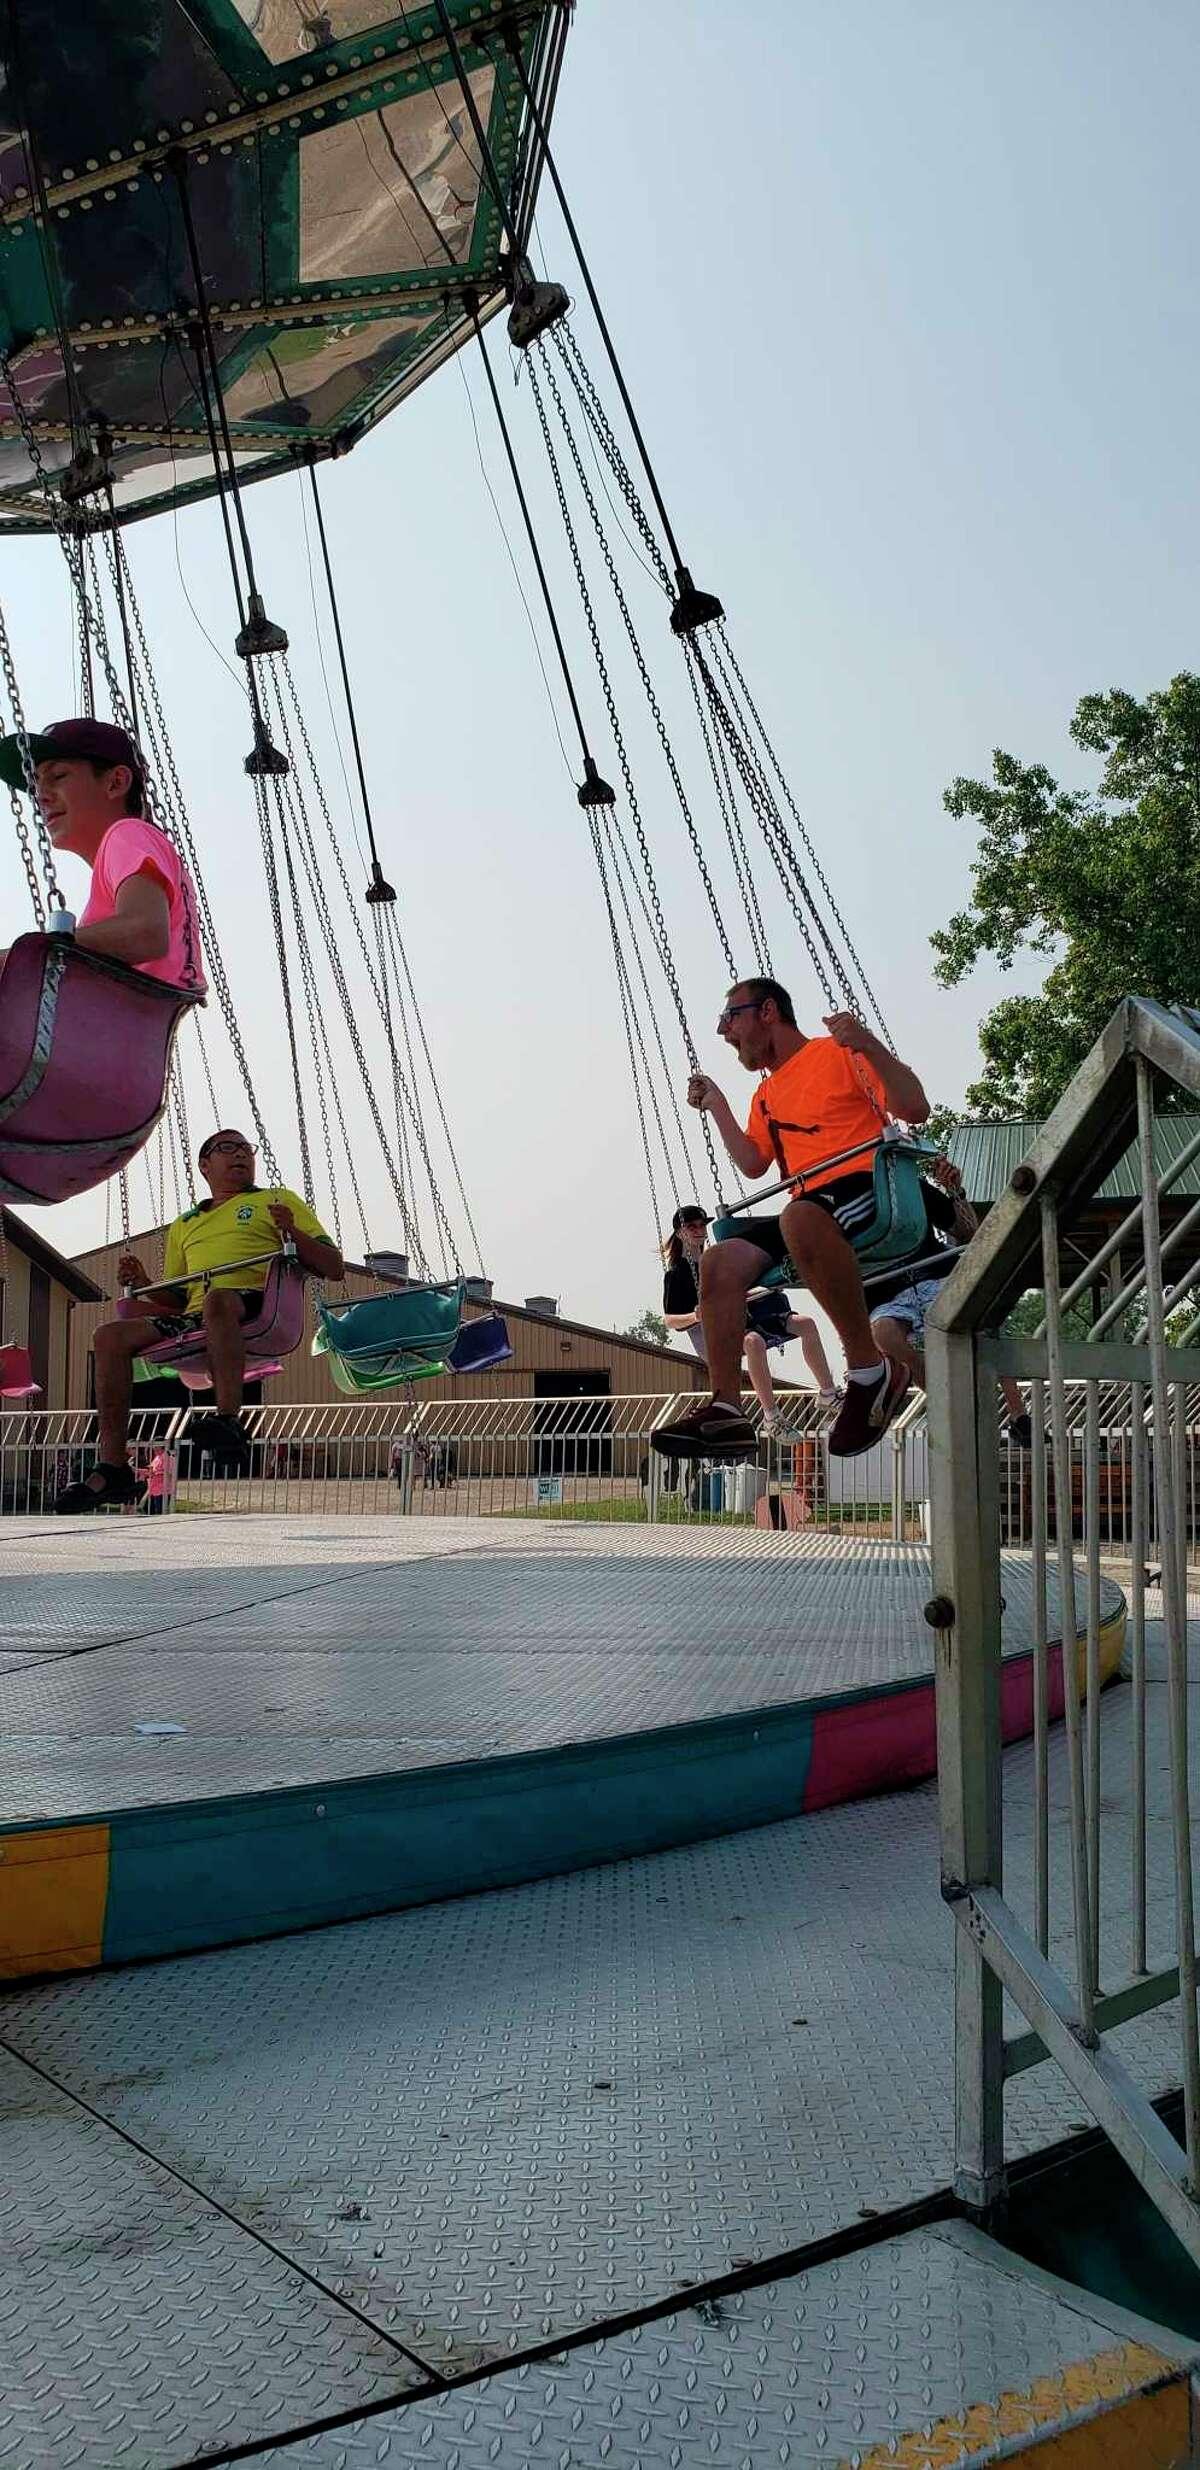 Kids enjoyed riding the swings at the Huron Community Fair. (Courtesy Photo)